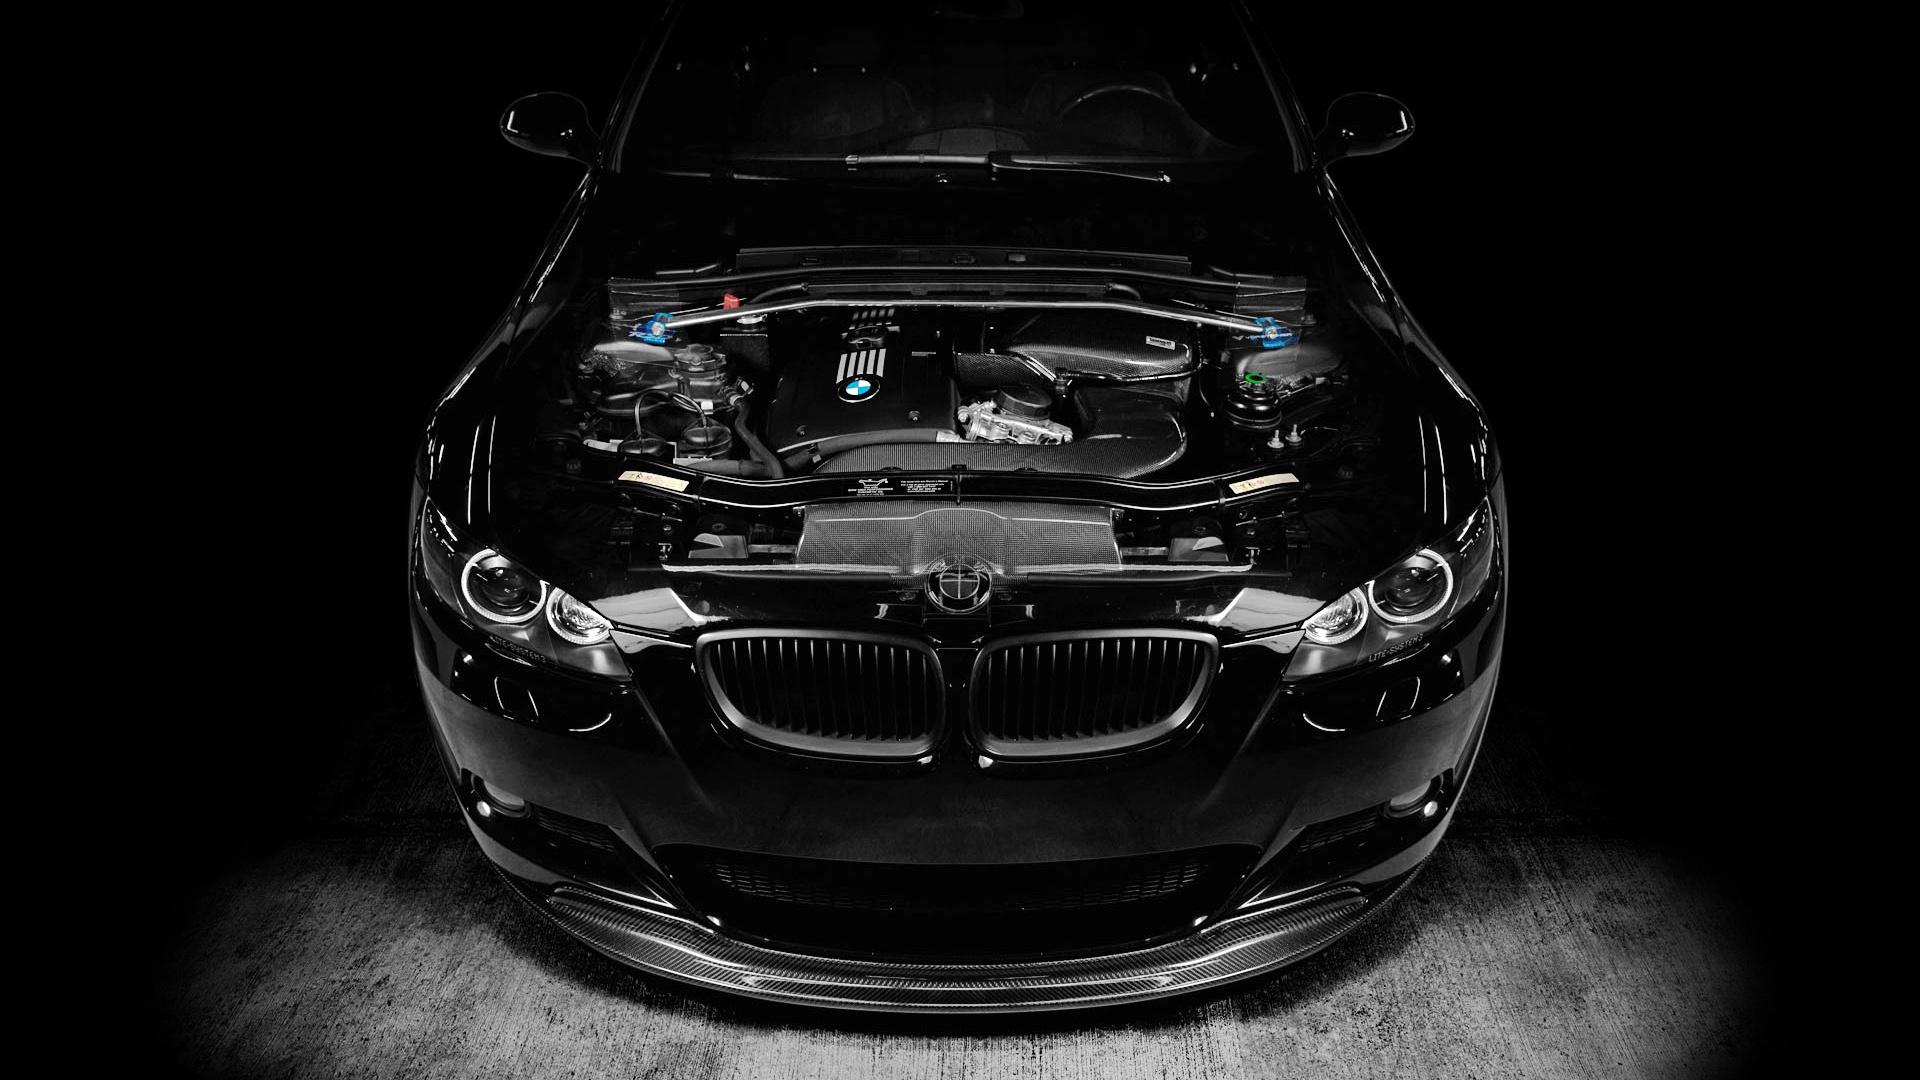 Wallpaper Bmw M3 Black Car Engine Tuning 1920x1080 Full Hd 2k